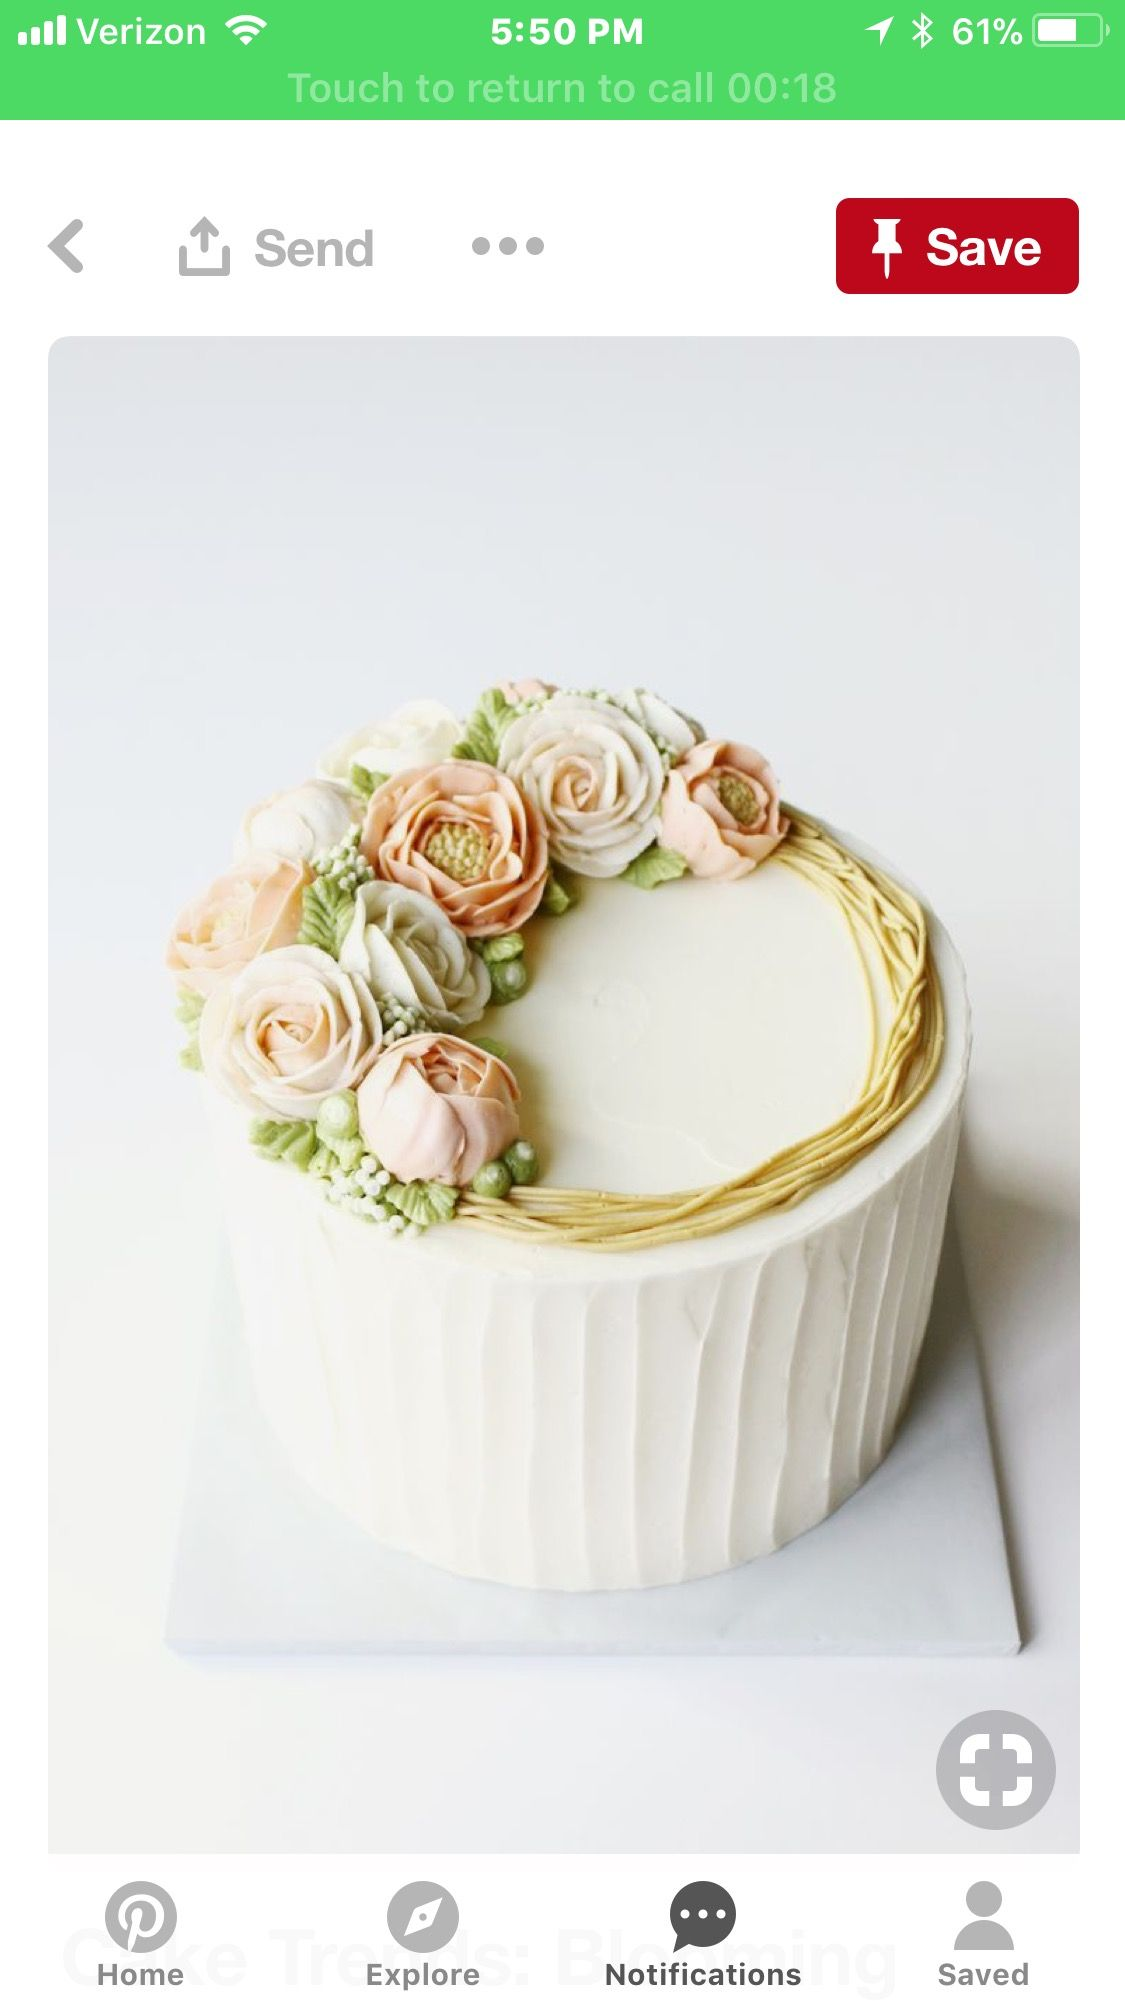 Pin by Moni Villa on Icing and Decor | Pinterest | Anna cake, Cake ...